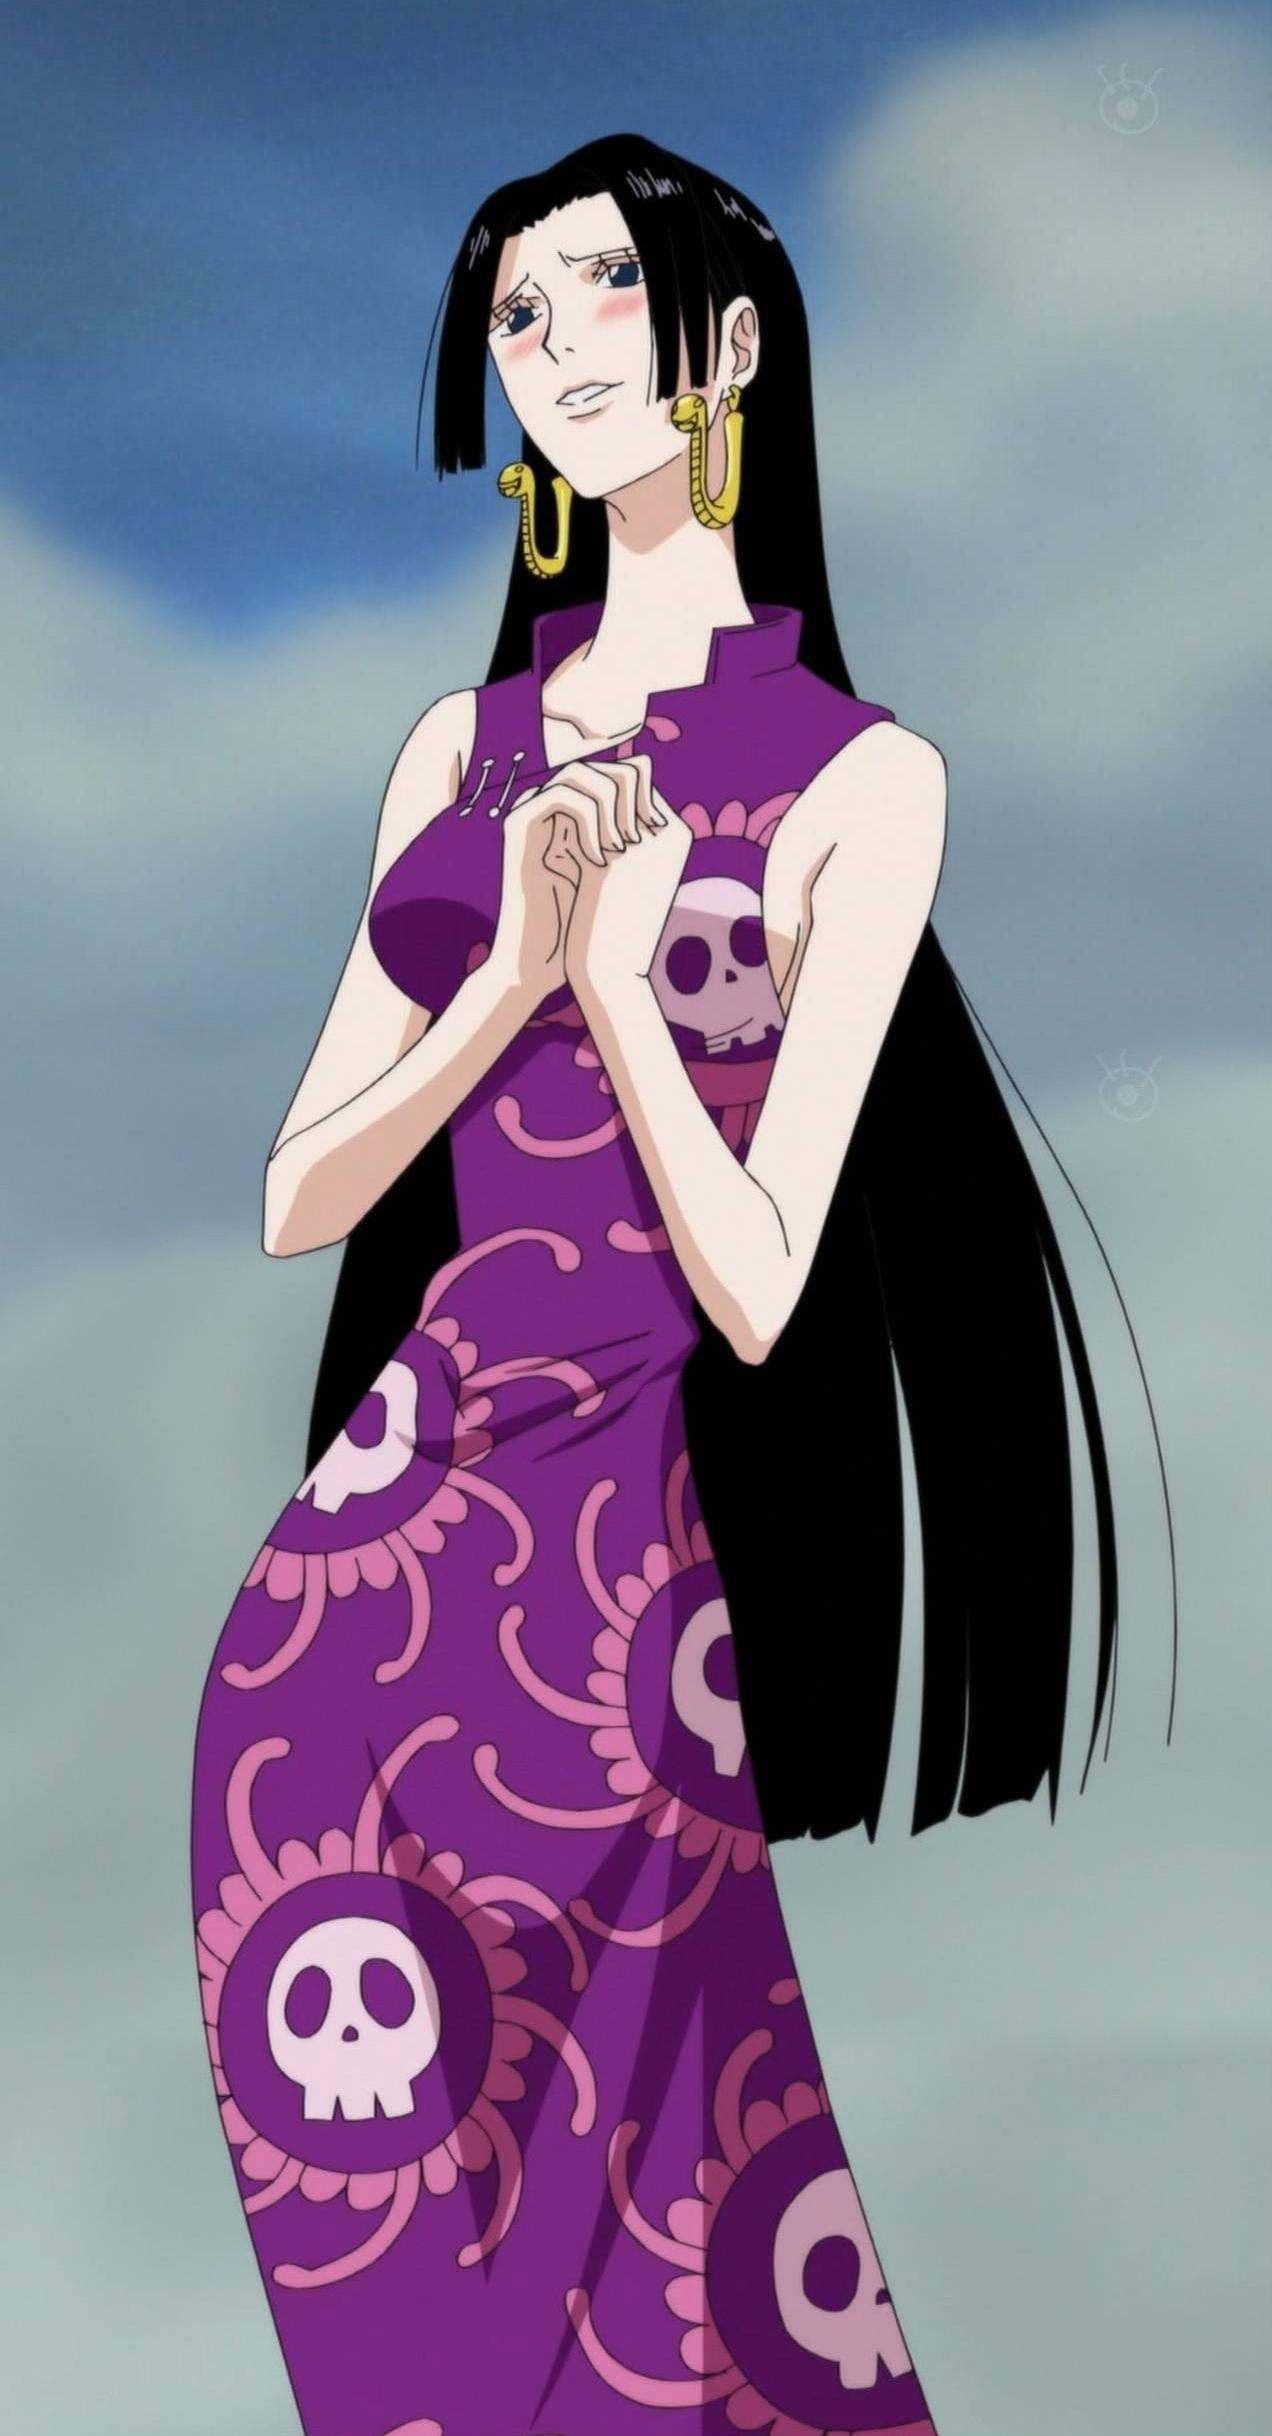 boa hancock one piece wiki - Anime Top Wallpaper